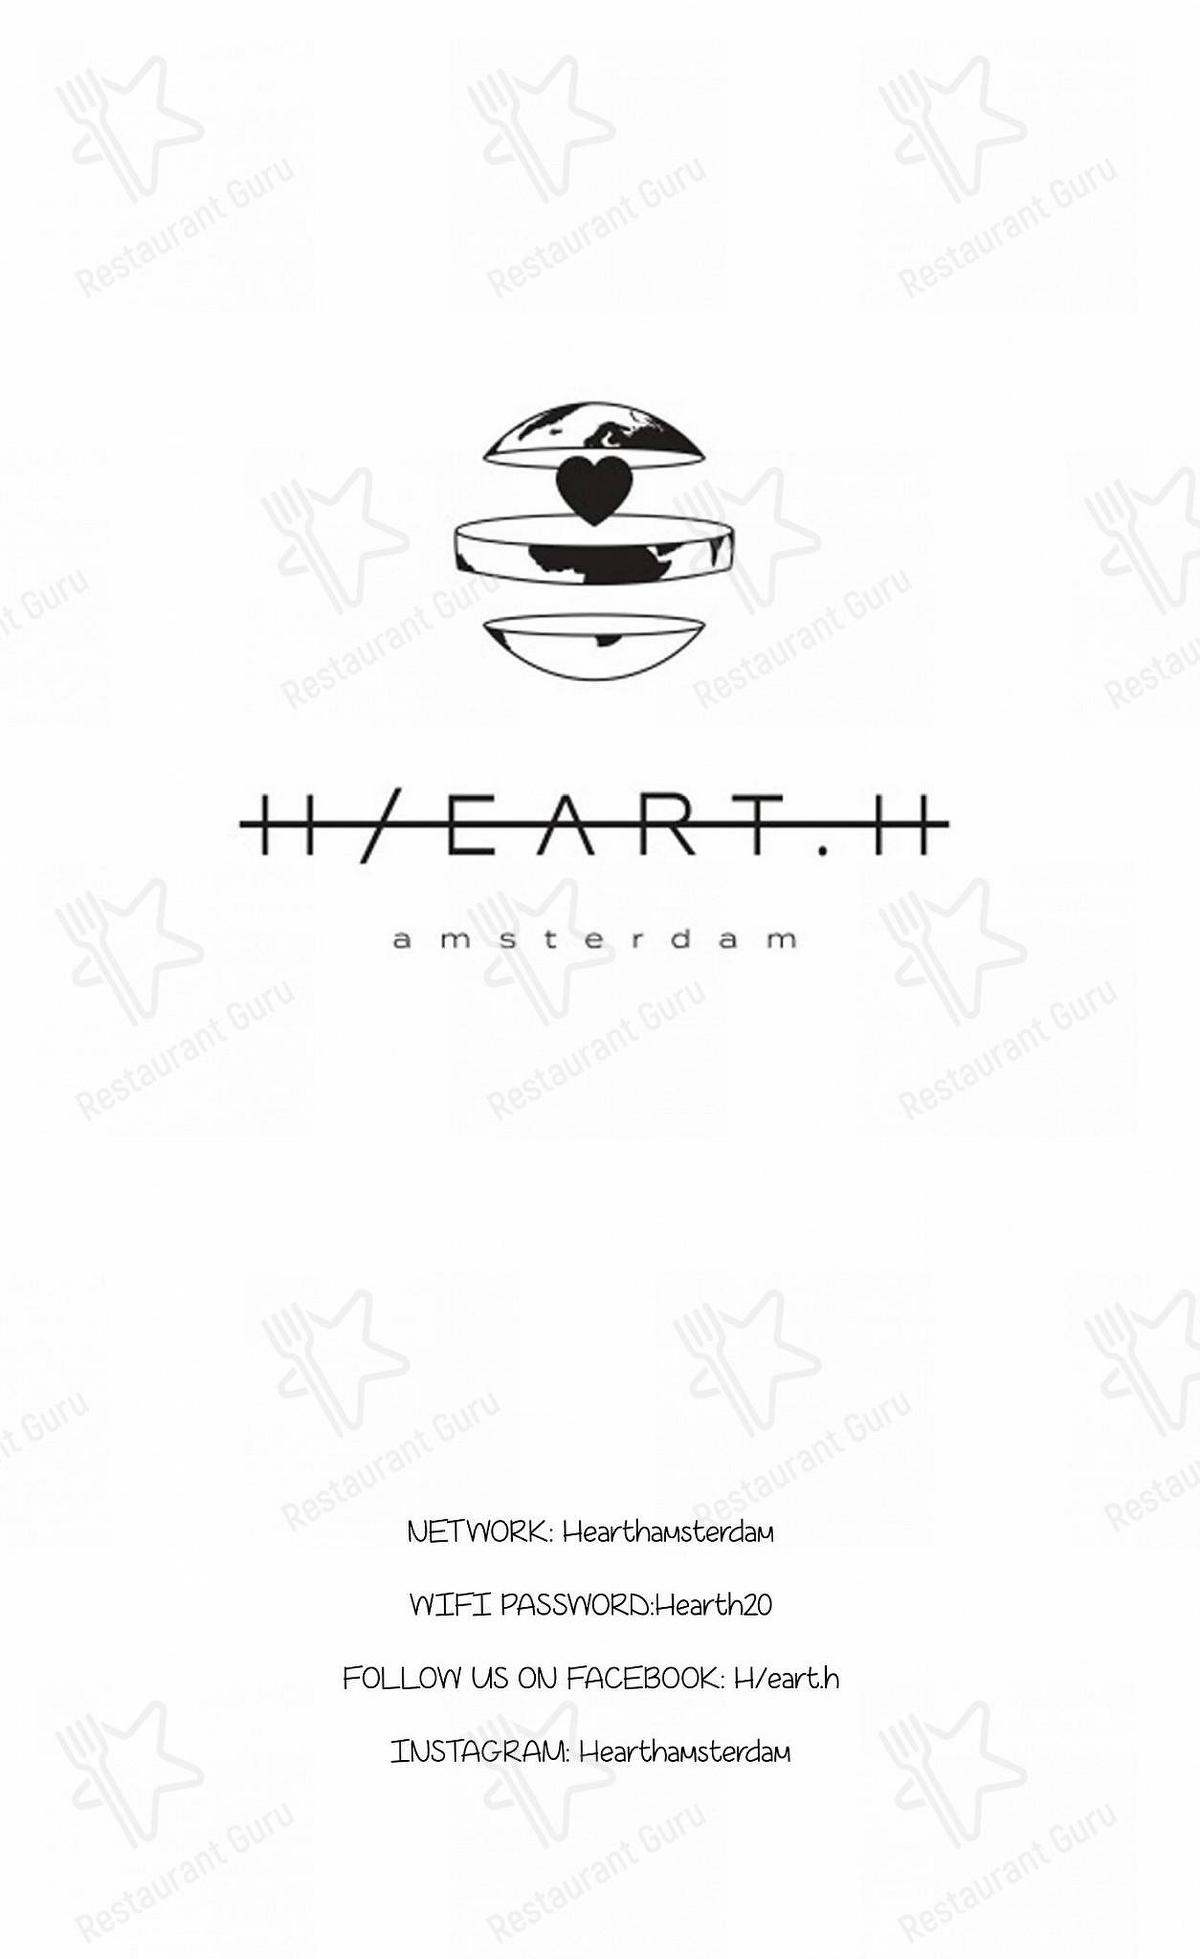 Hearth Speisekarte